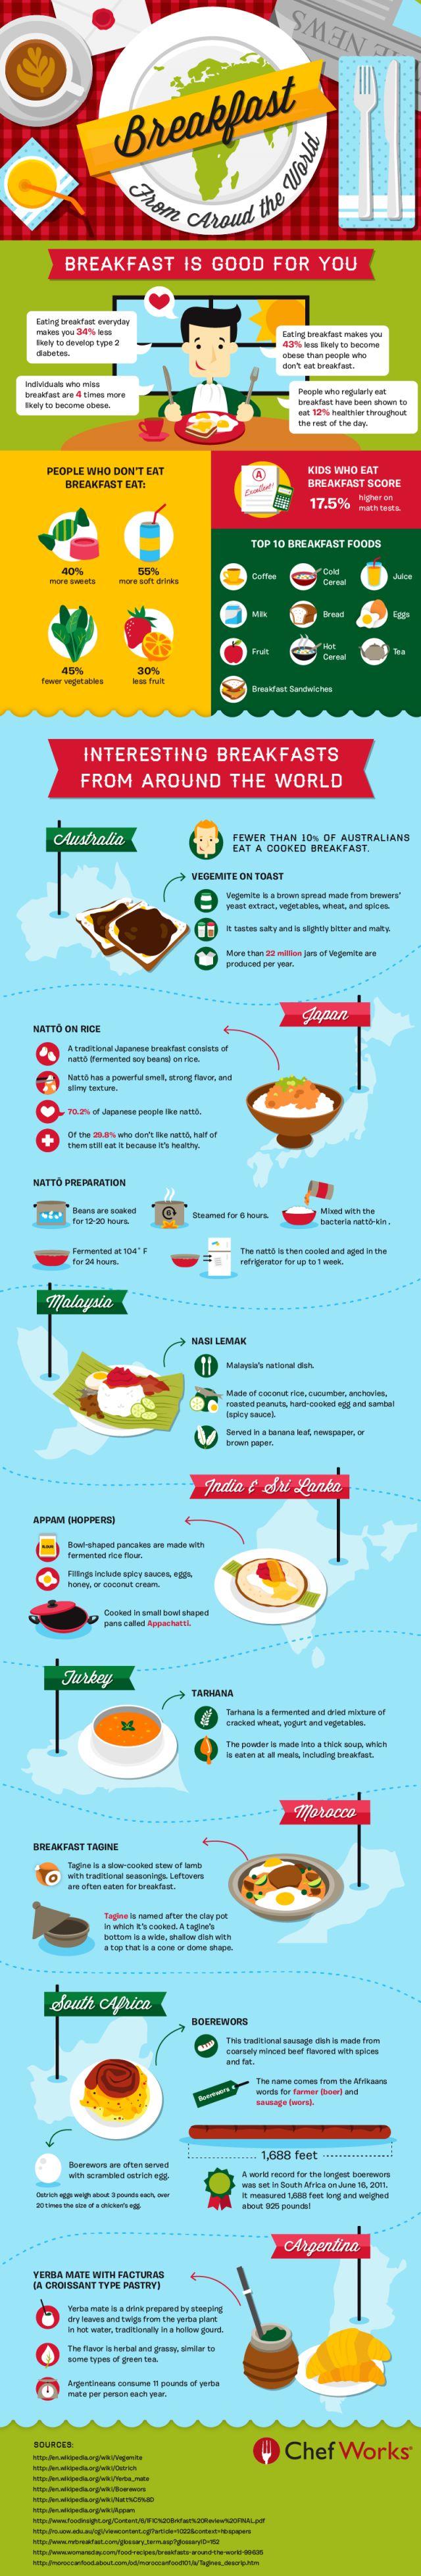 Breakfast Around the World by chefworks #Infographic #Breakfast #Health